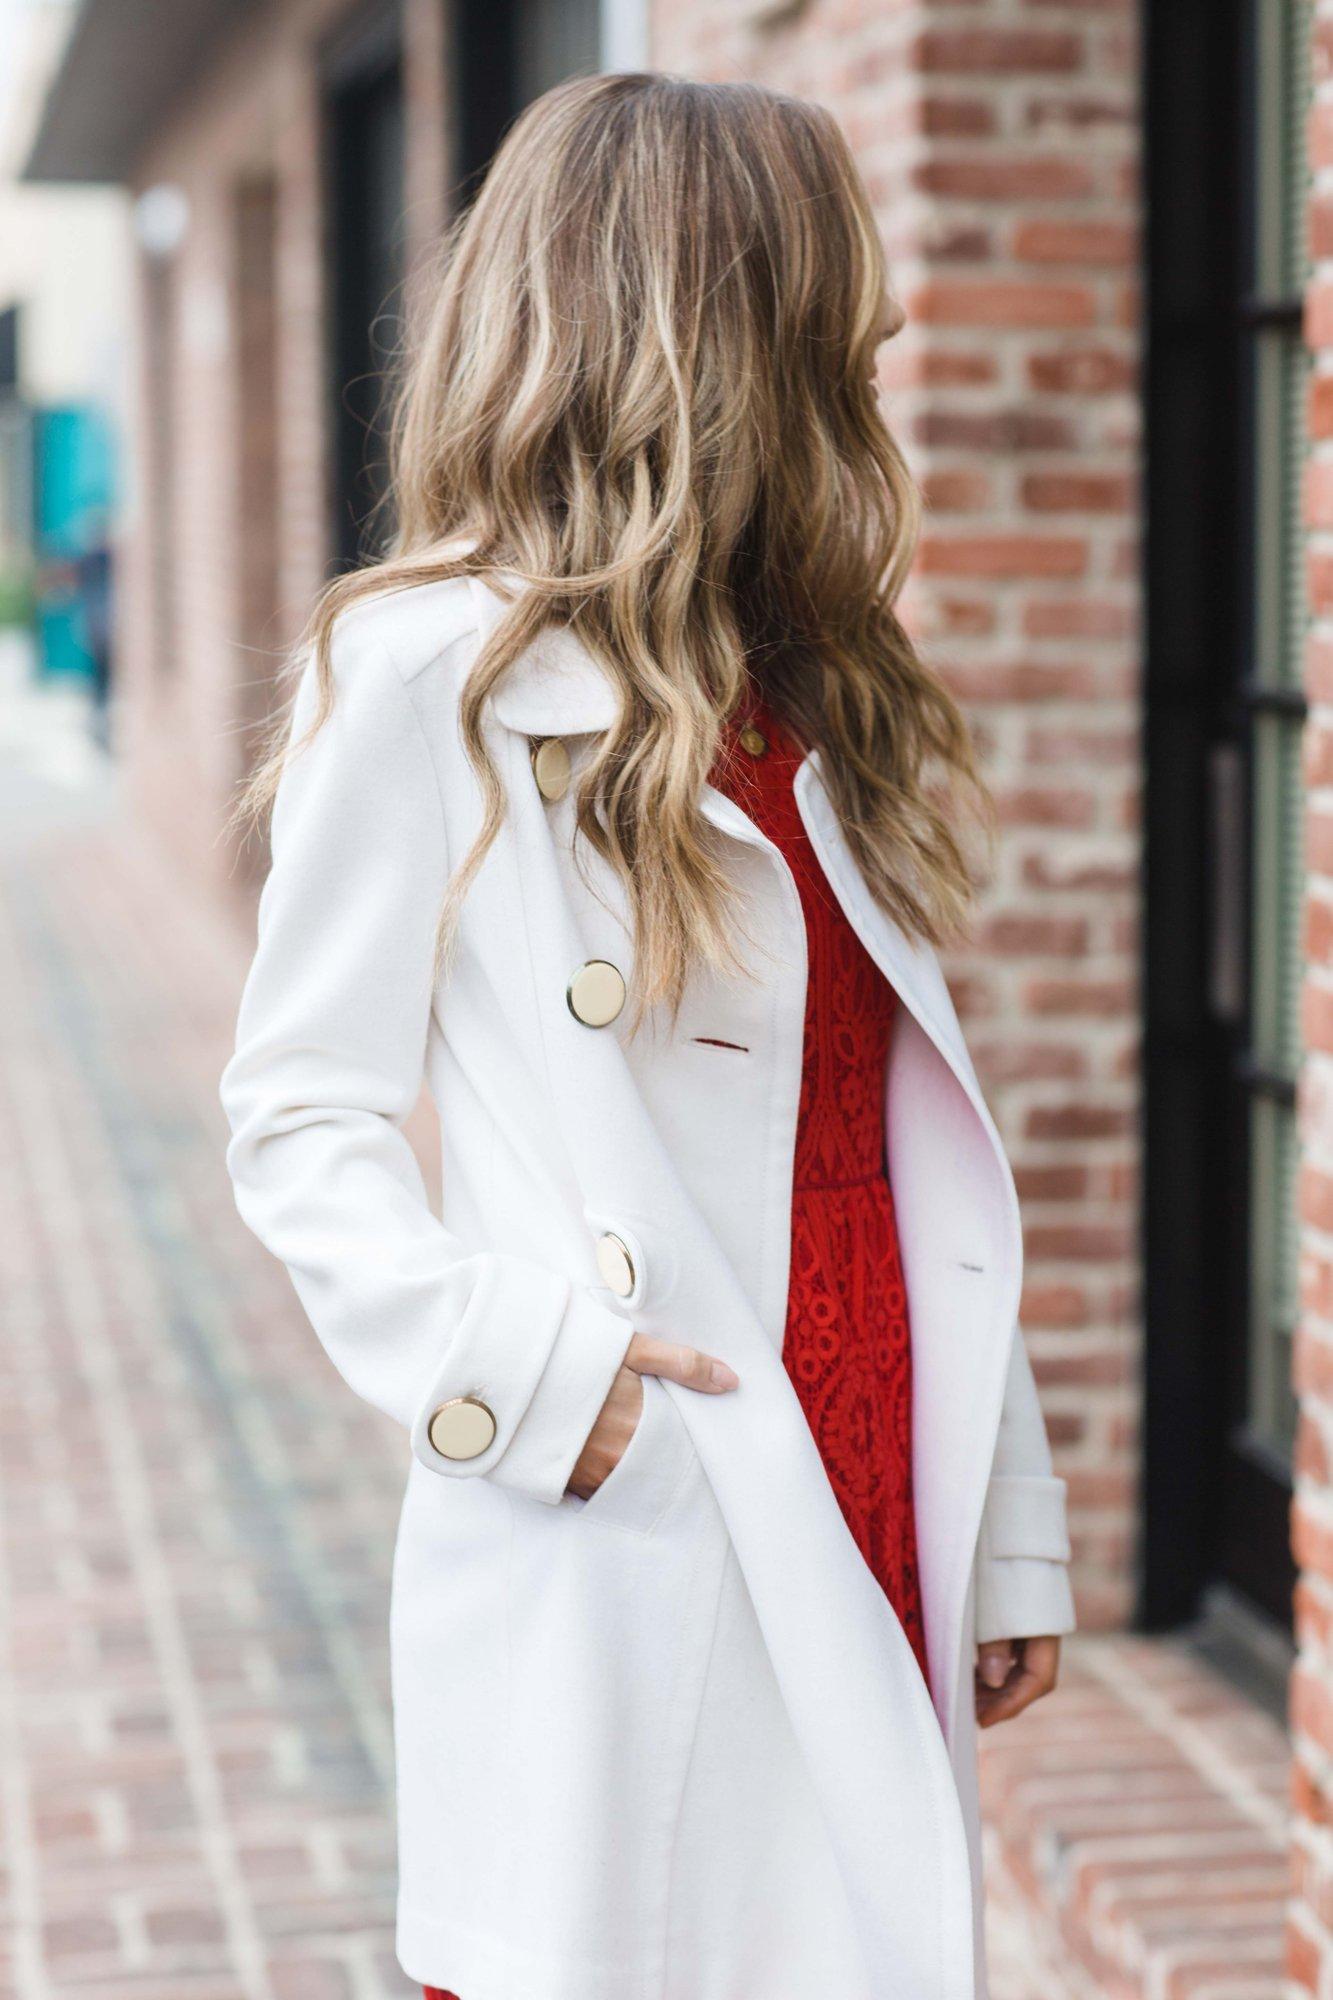 Merrick's Art White Coat